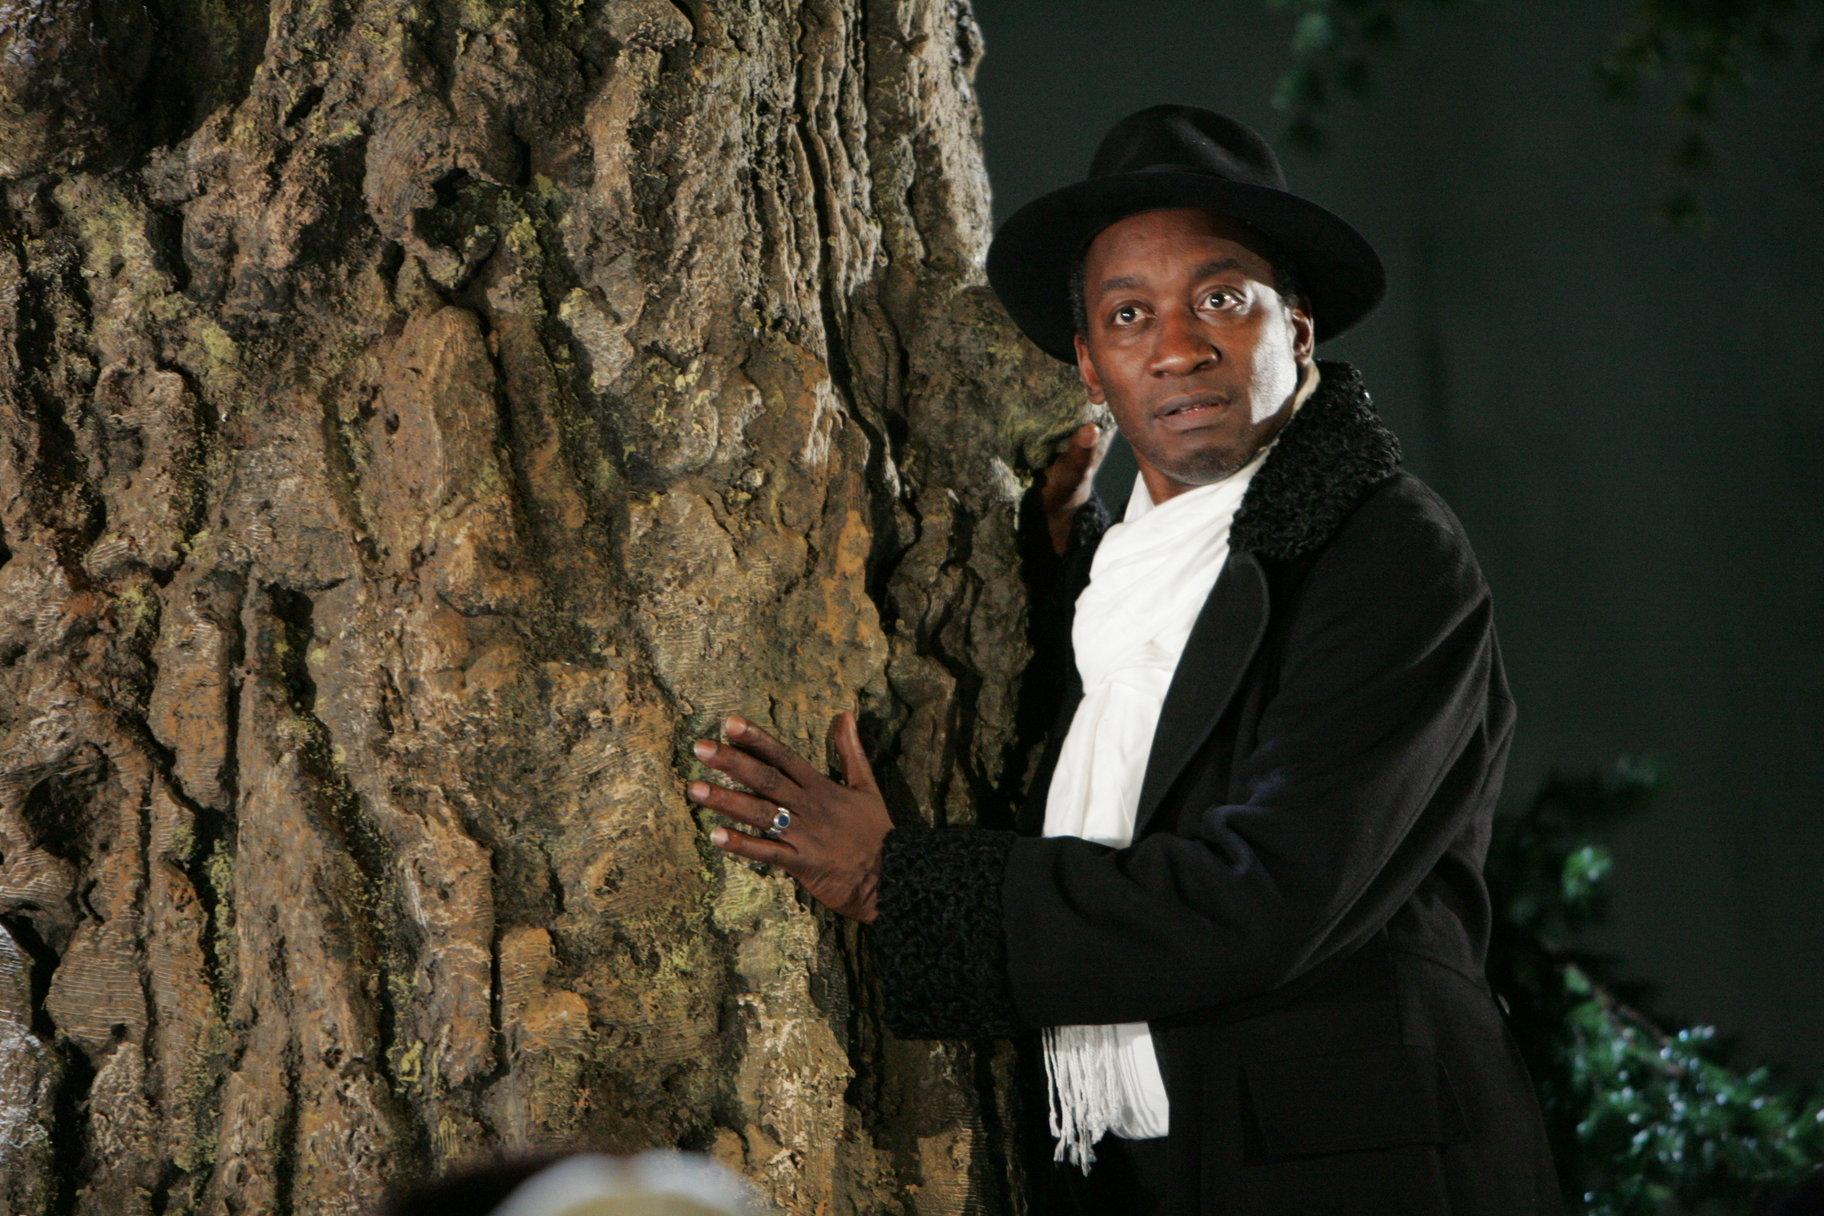 A man leans against a tree.